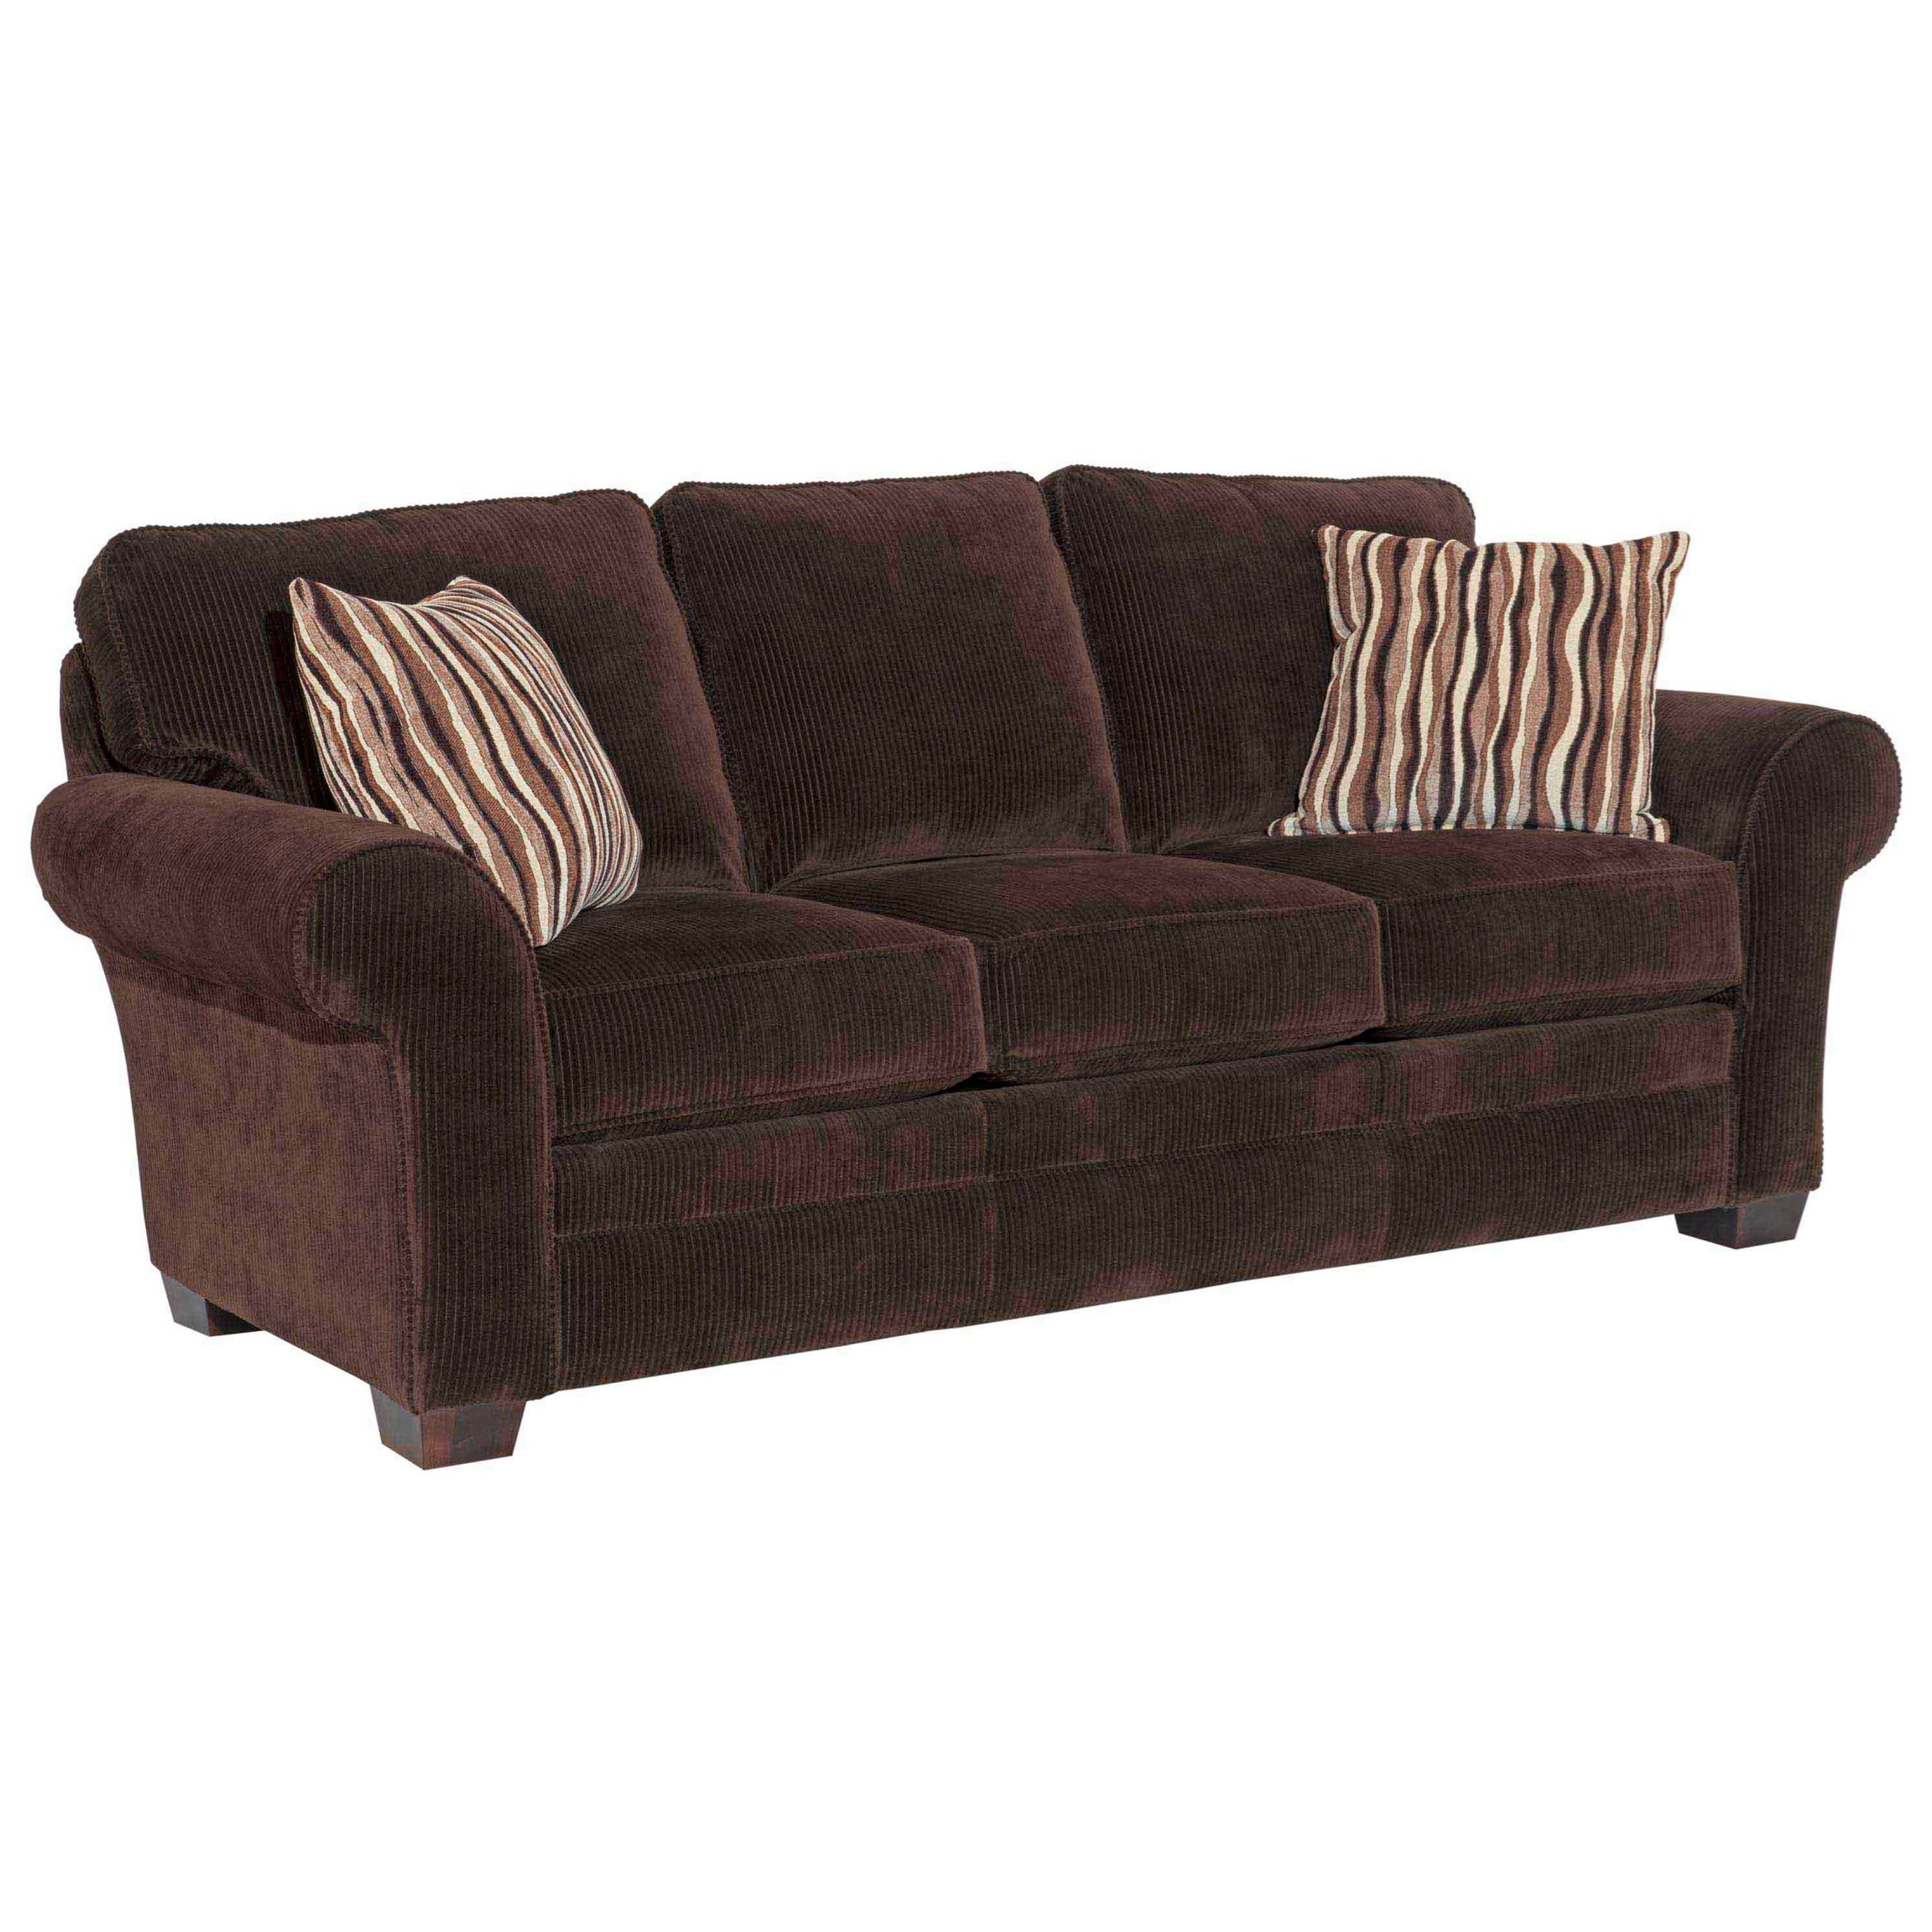 Broyhill Furniture Zachary Queen IREST Sleeper - Item Number: 7902-7M-7973-87